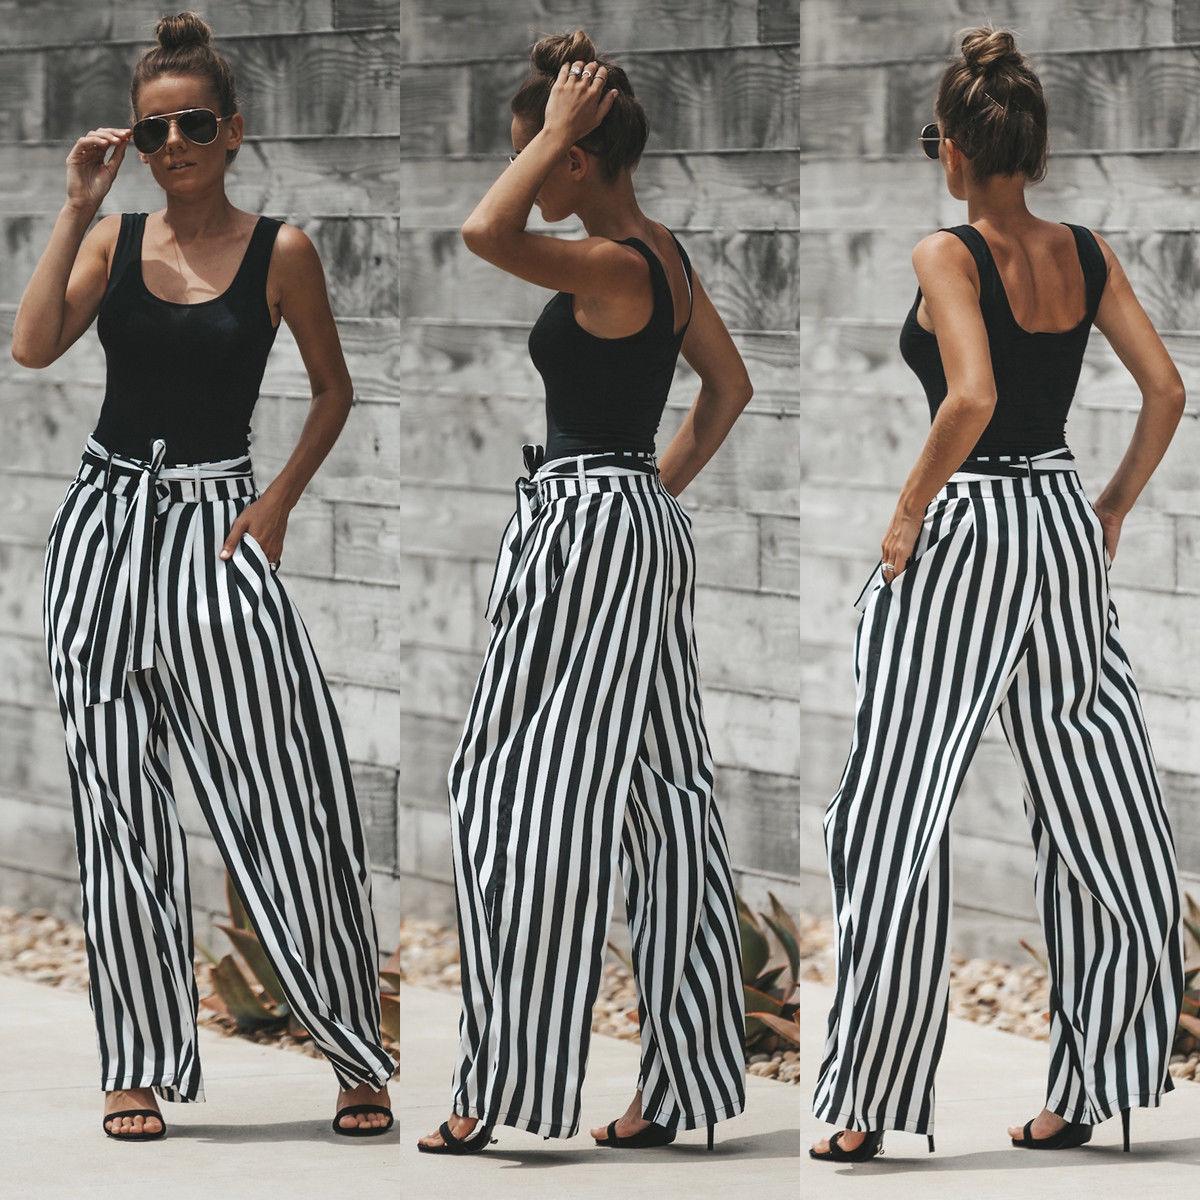 2018 Fashion Pants Women's High Waist Casual Black& White Striped Long Pants Ladies Wide Leg Loose Trousers Stylish Streetwear